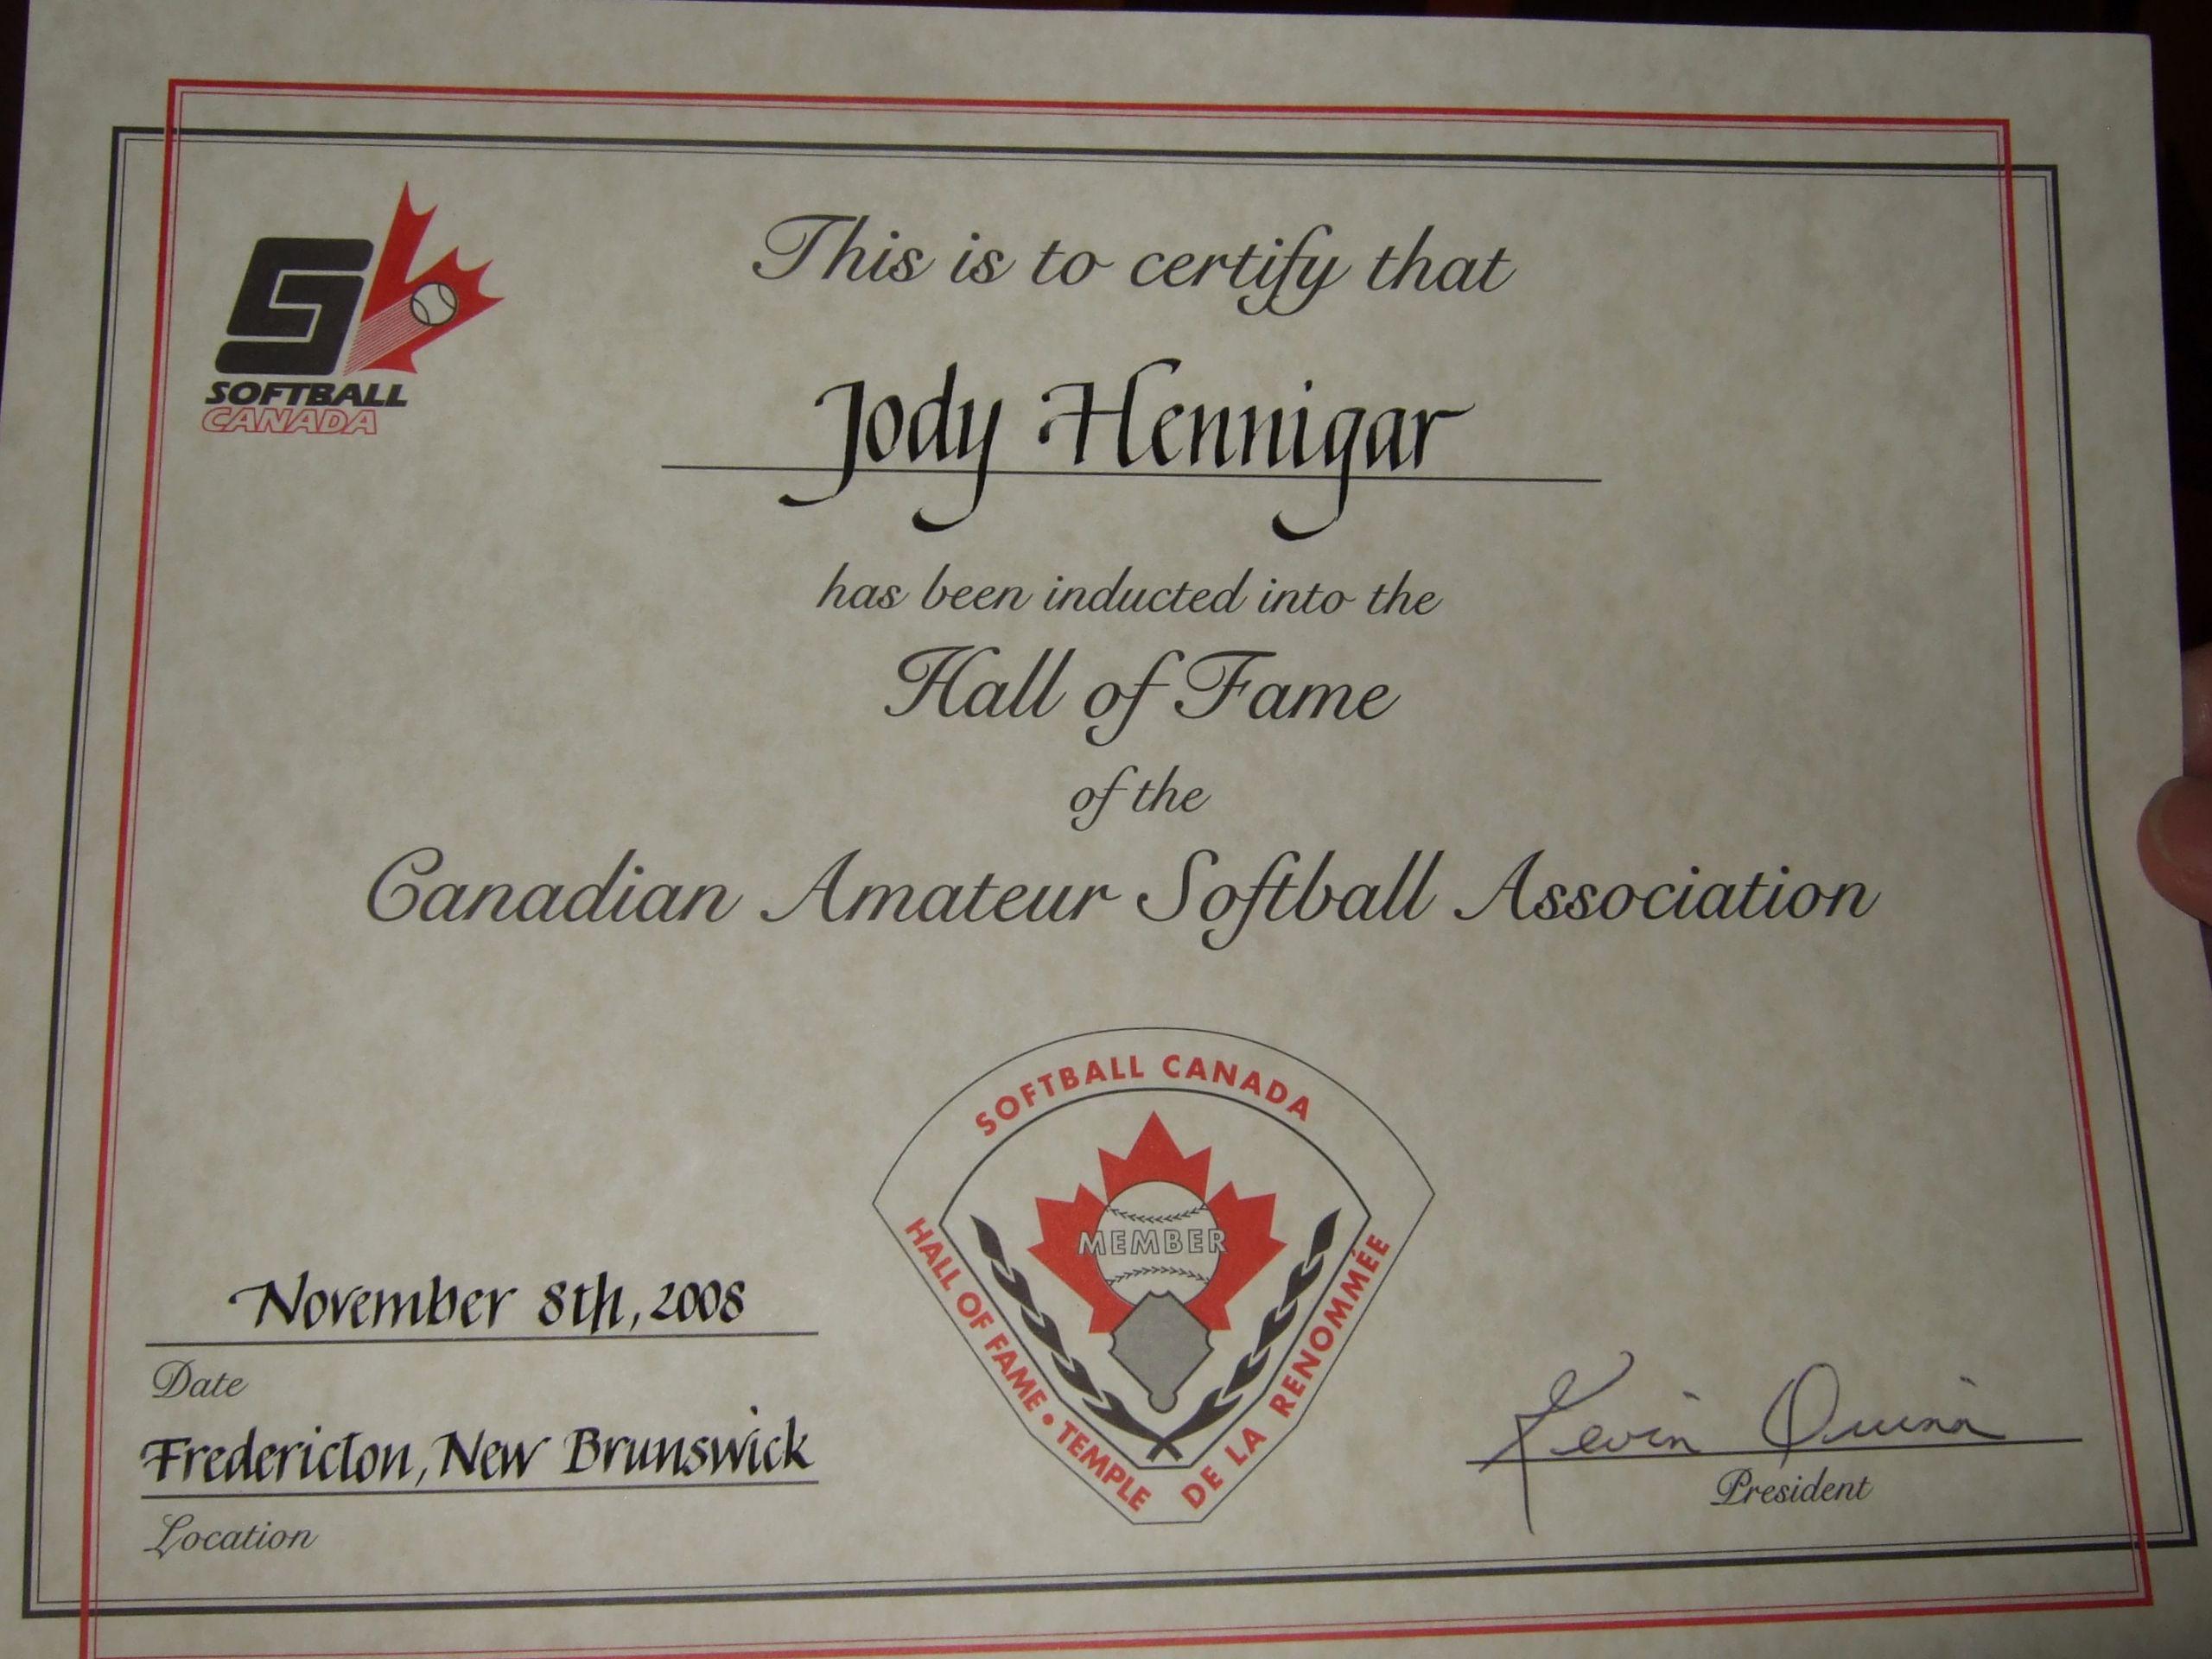 Hall Of Fame Certificate Lovely toronto Gators